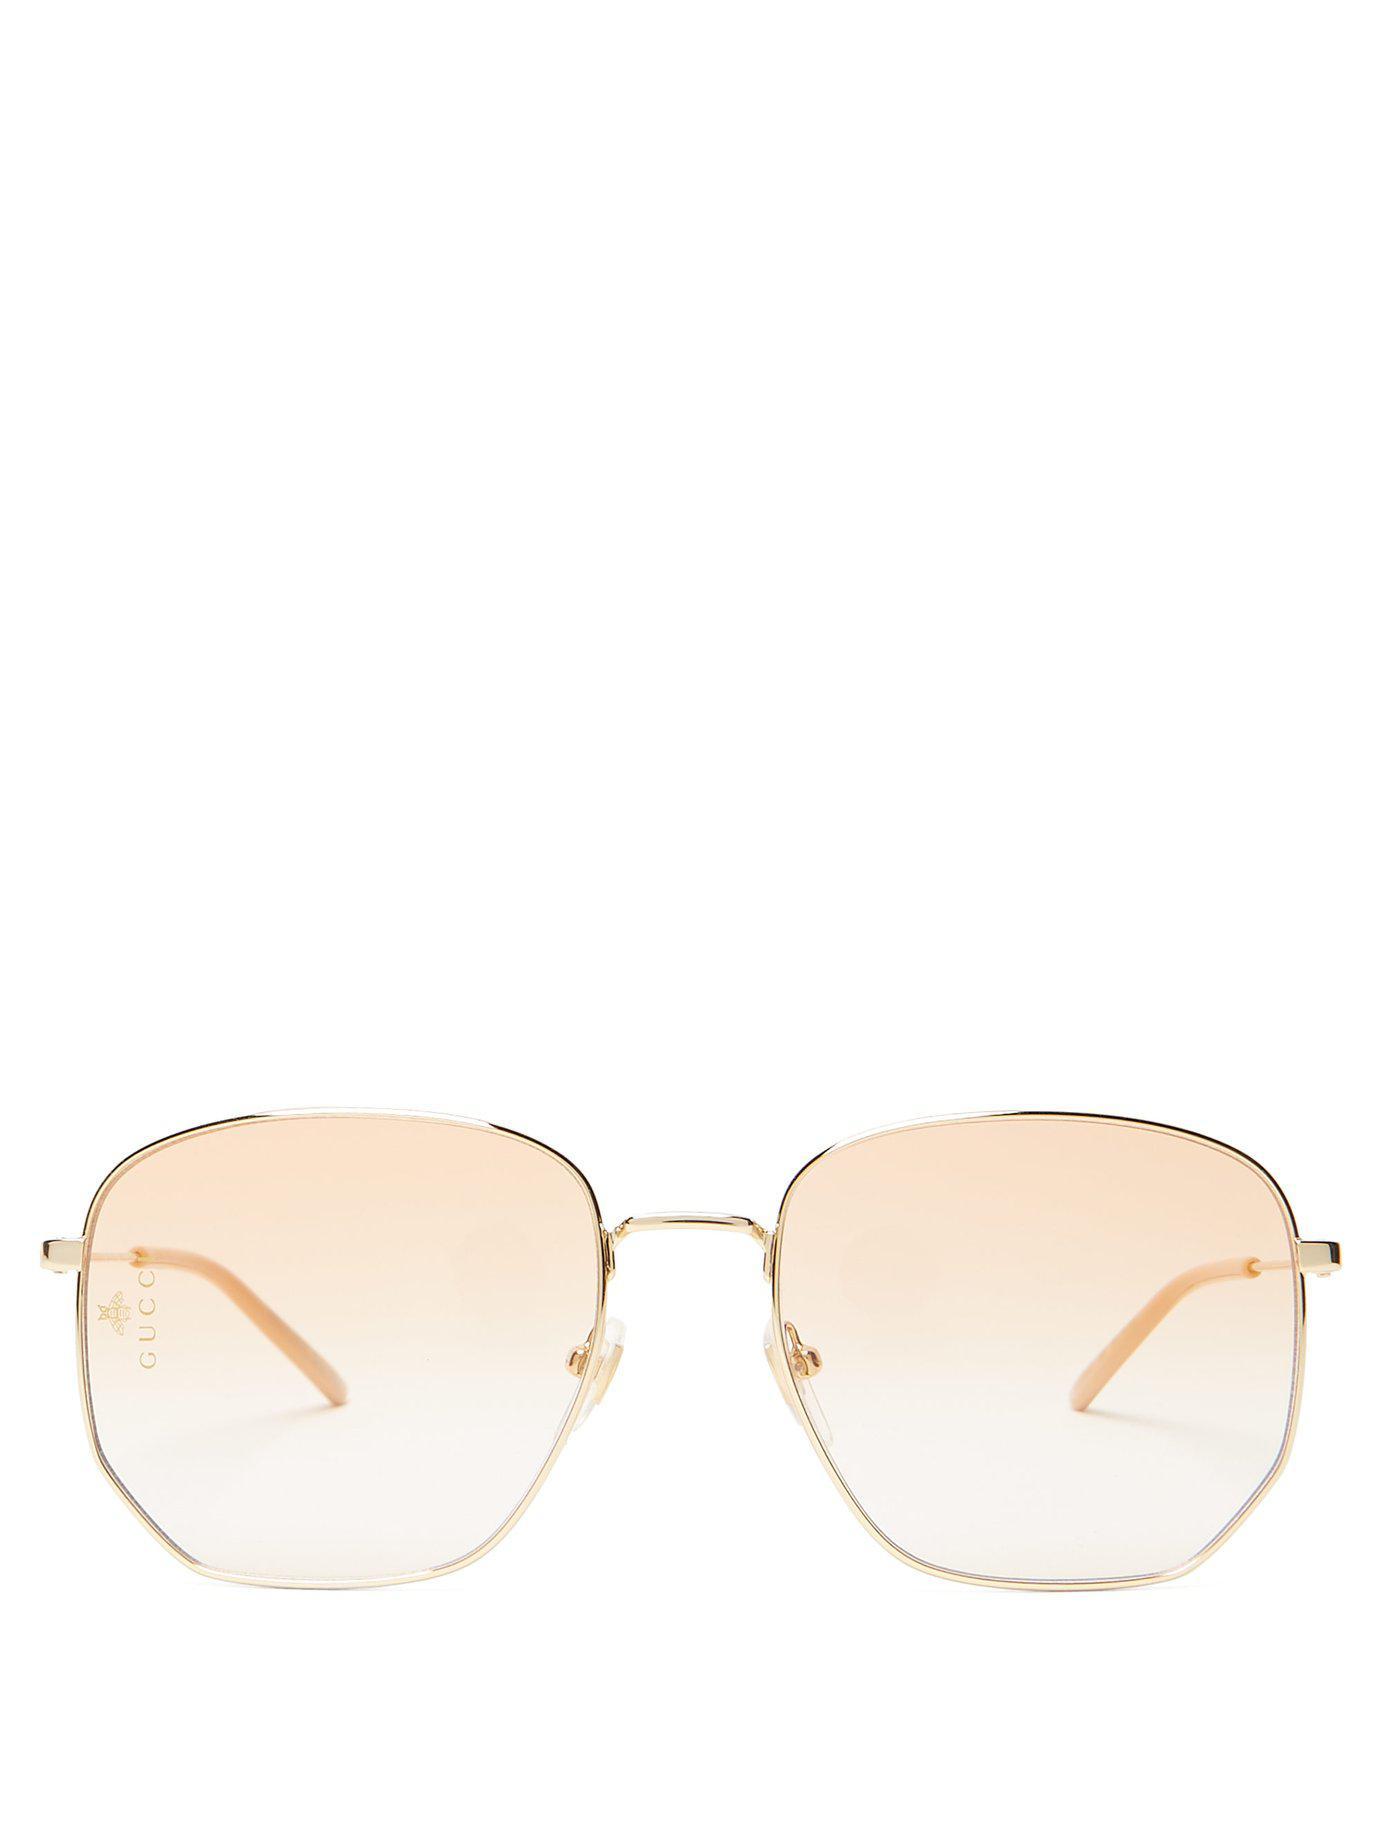 edad075bcb Lyst - Gucci Square Frame Metal Glasses in Metallic for Men